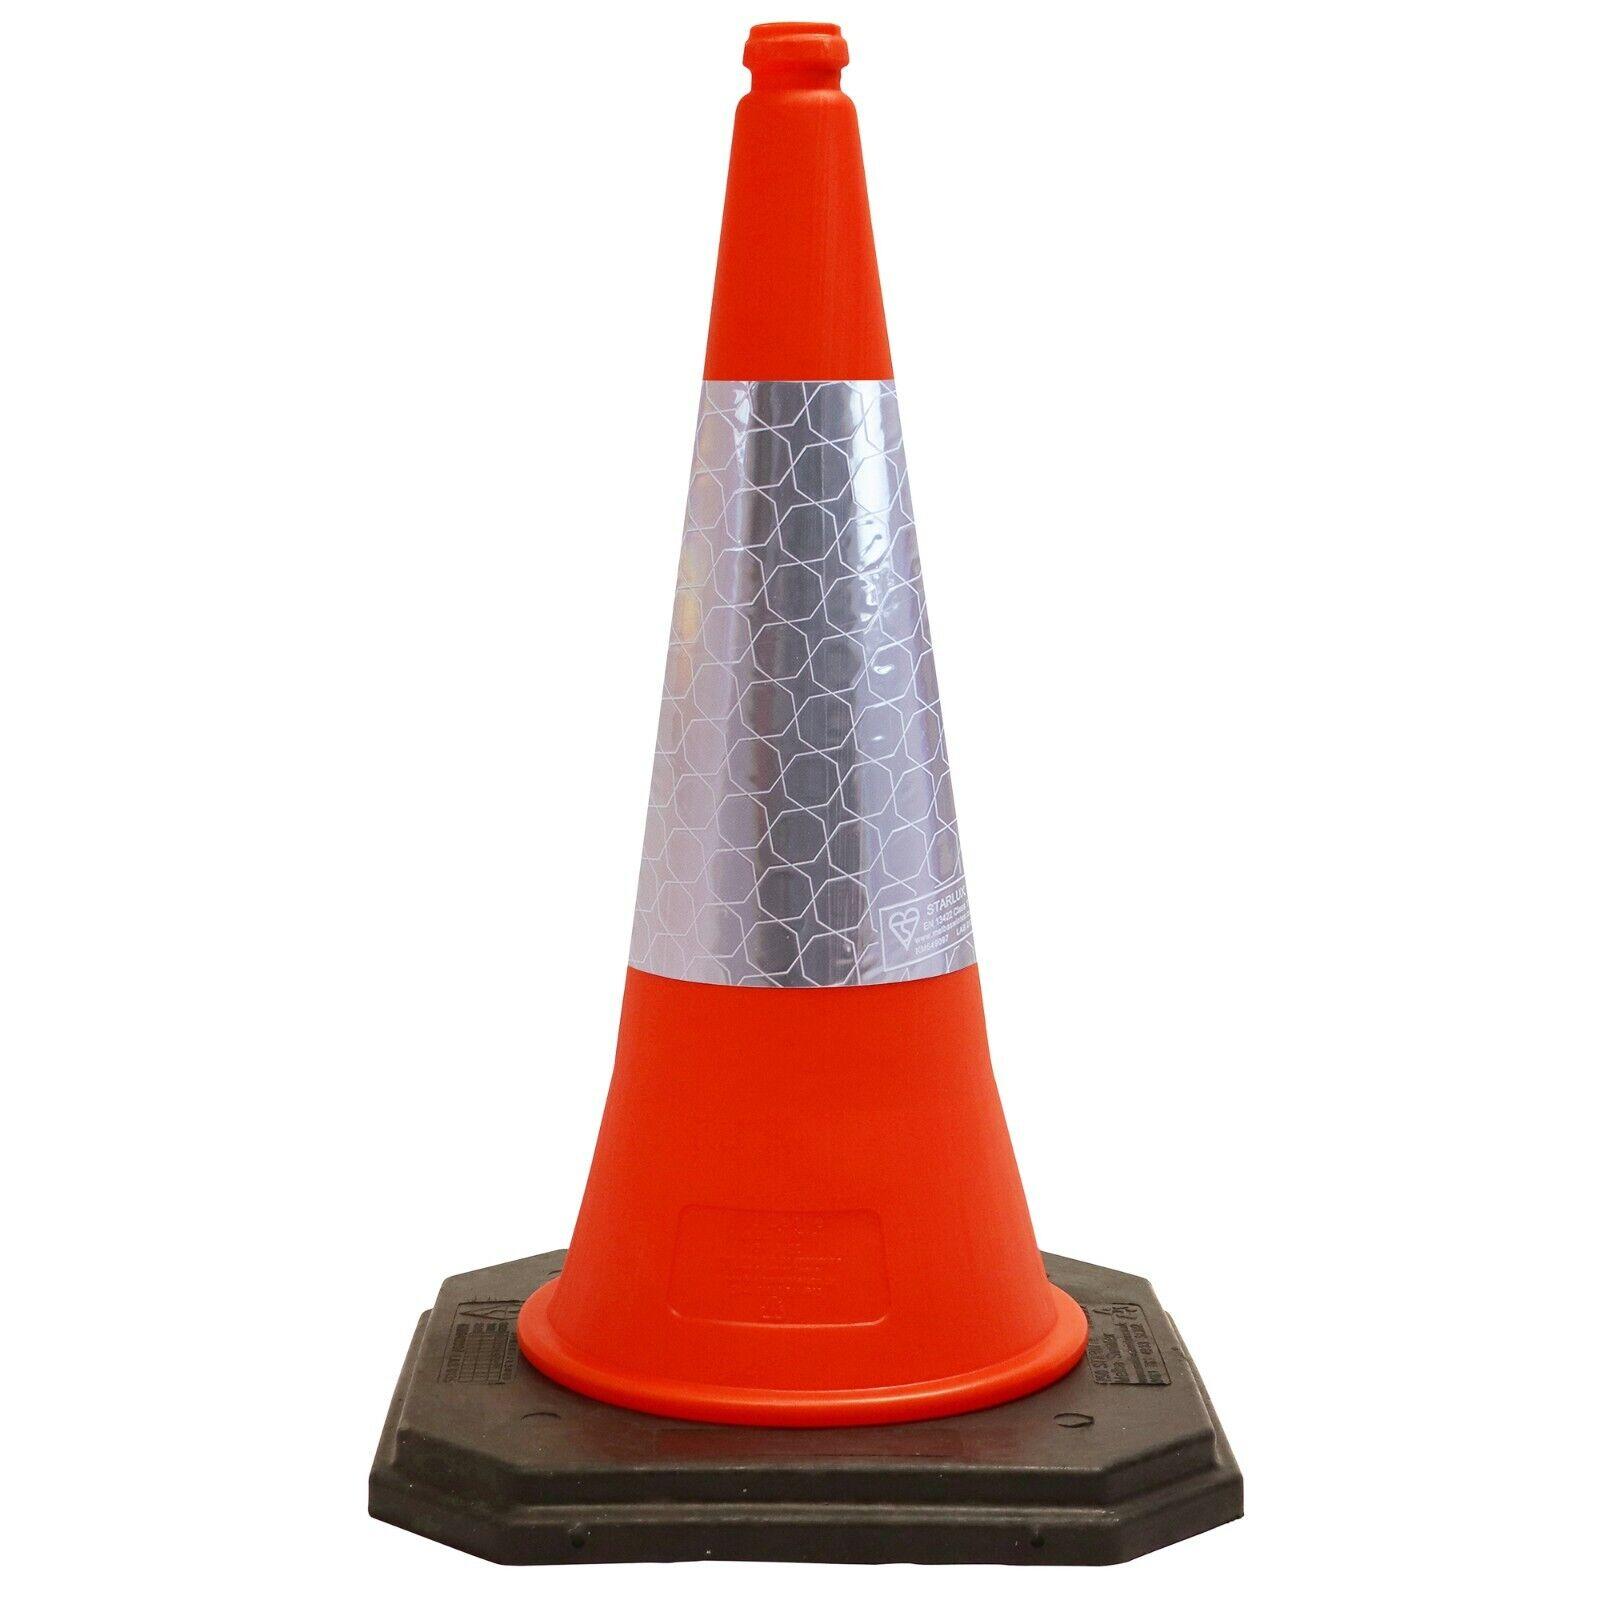 750mm Road Traffic Cone 2-Piece Design Heavy Duty Safety Street Cone Orange